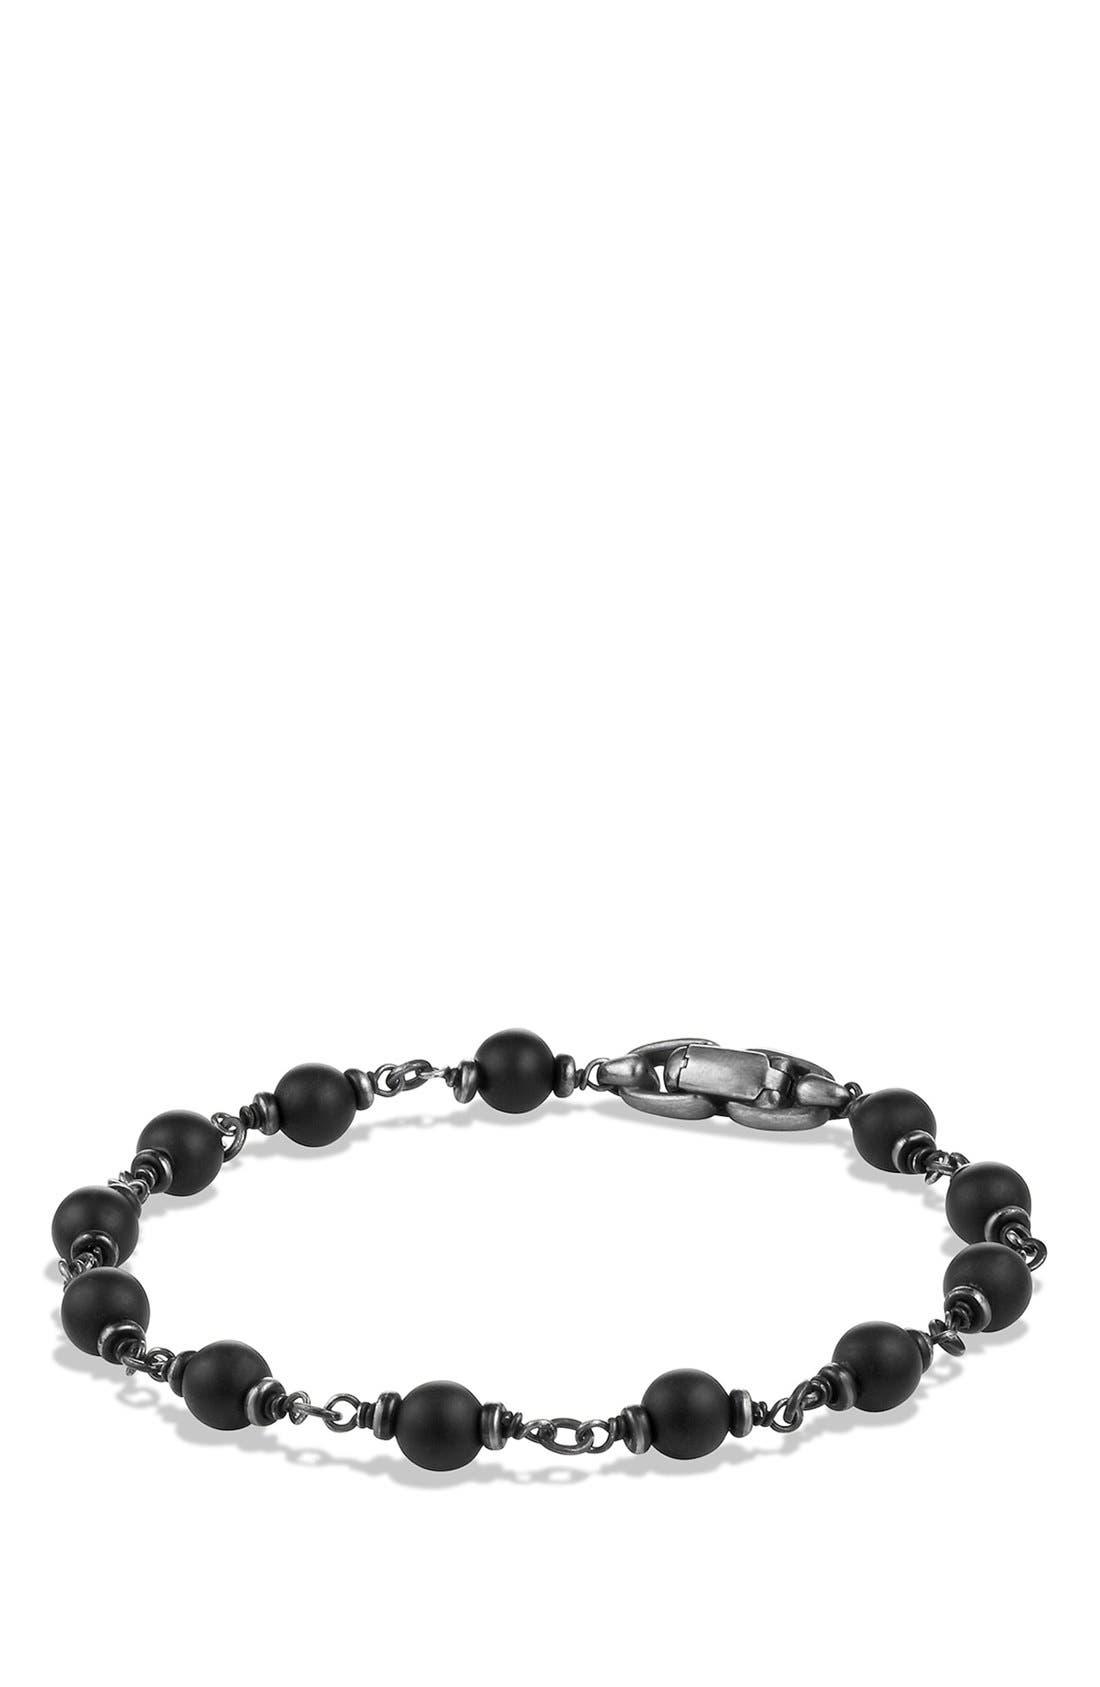 DAVID YURMAN Spiritual Beads Rosary Bead Bracelet